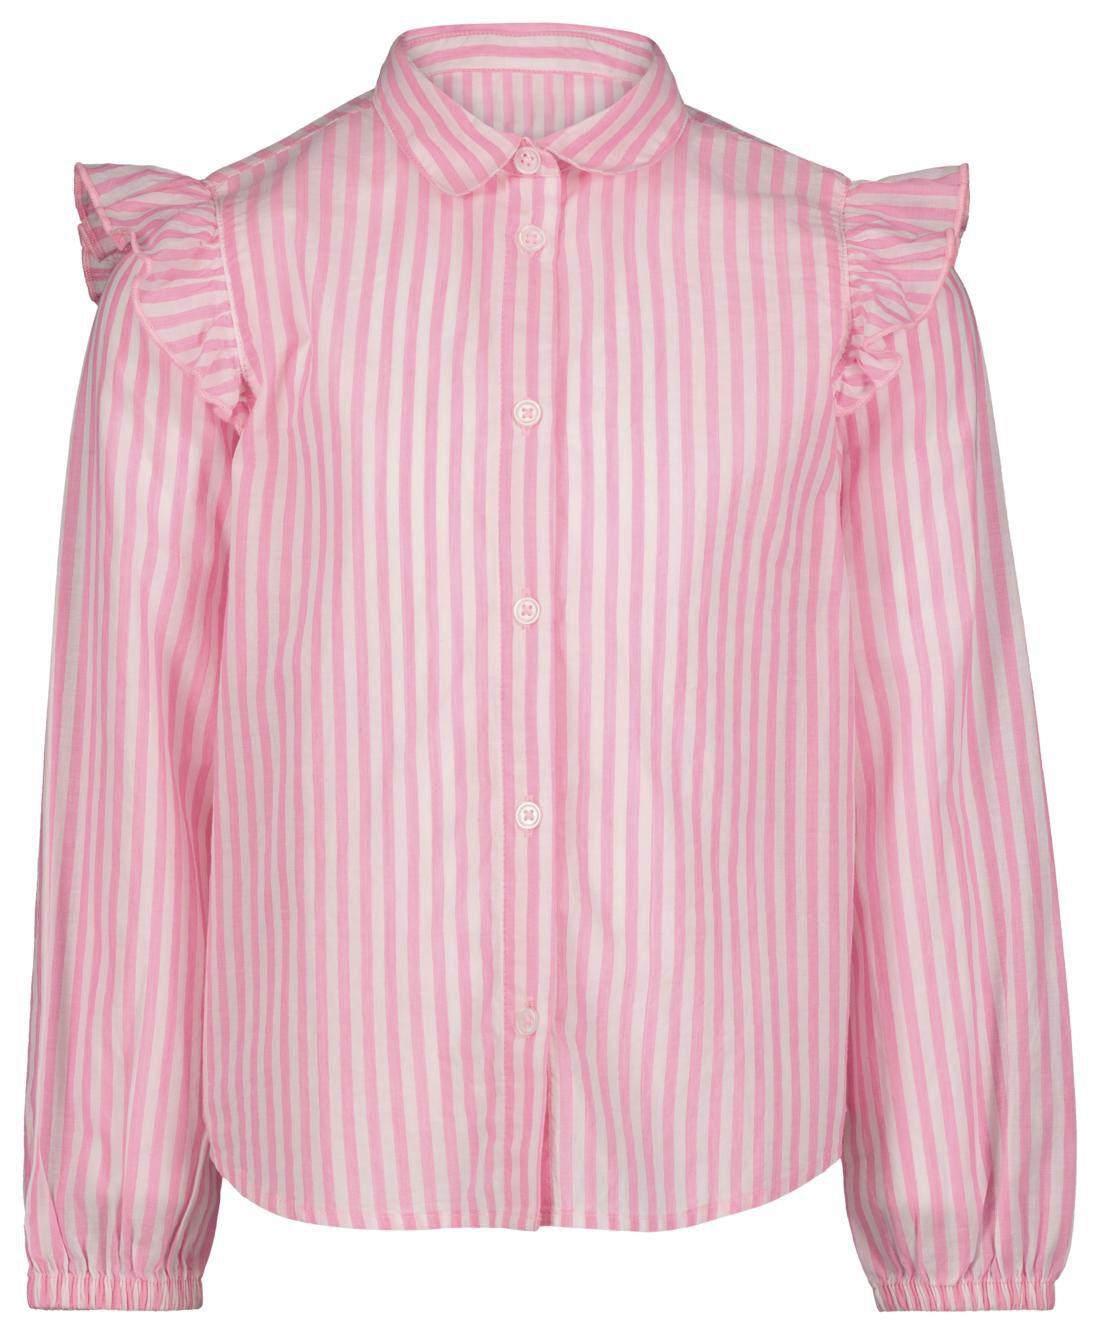 HEMA Kinderblouse Strepen Fluor Roze (fluor roze)